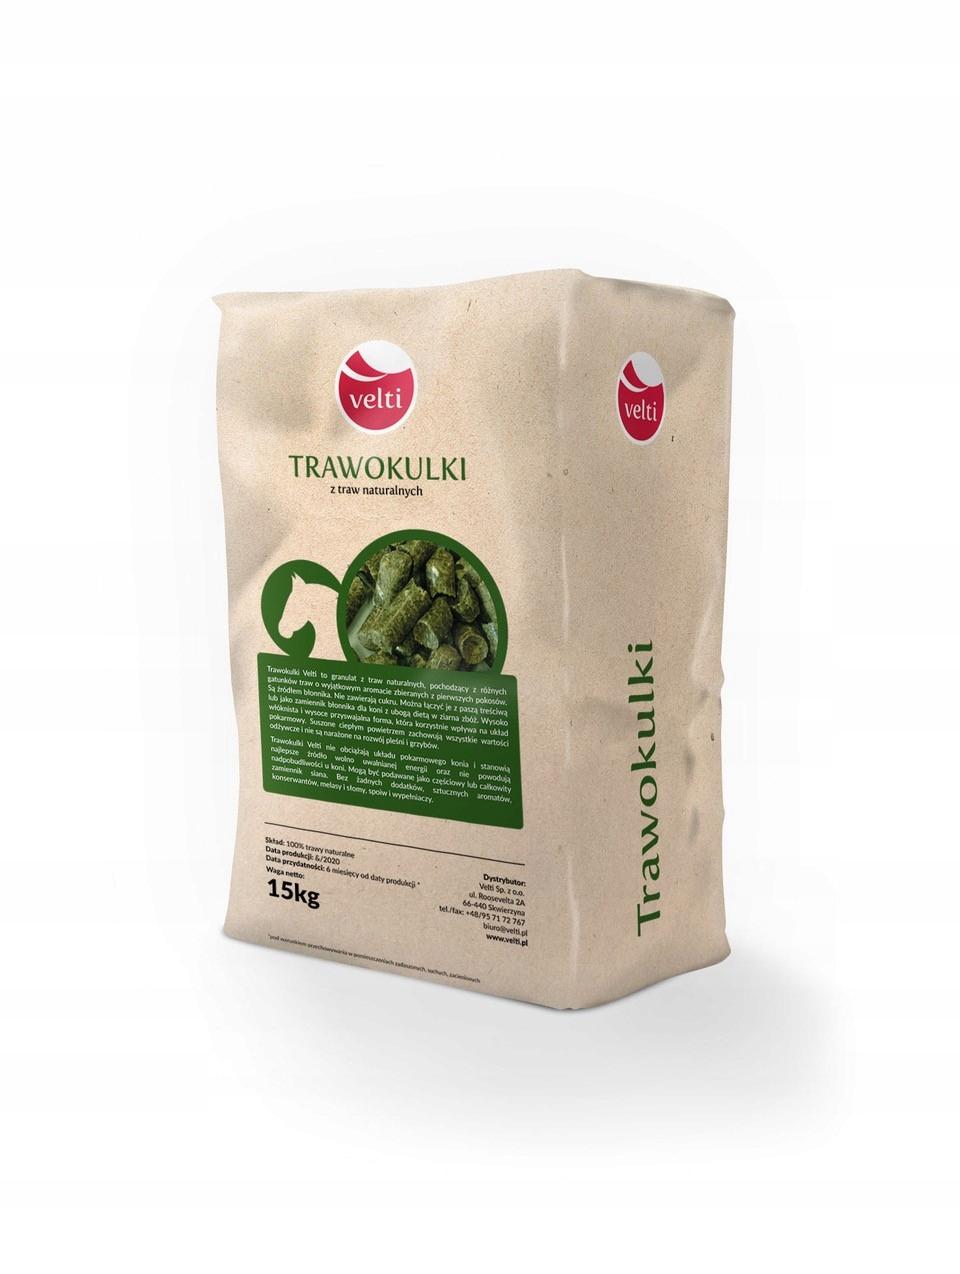 Trawokulki Velti 30 кг из натуральных трав для лошадей